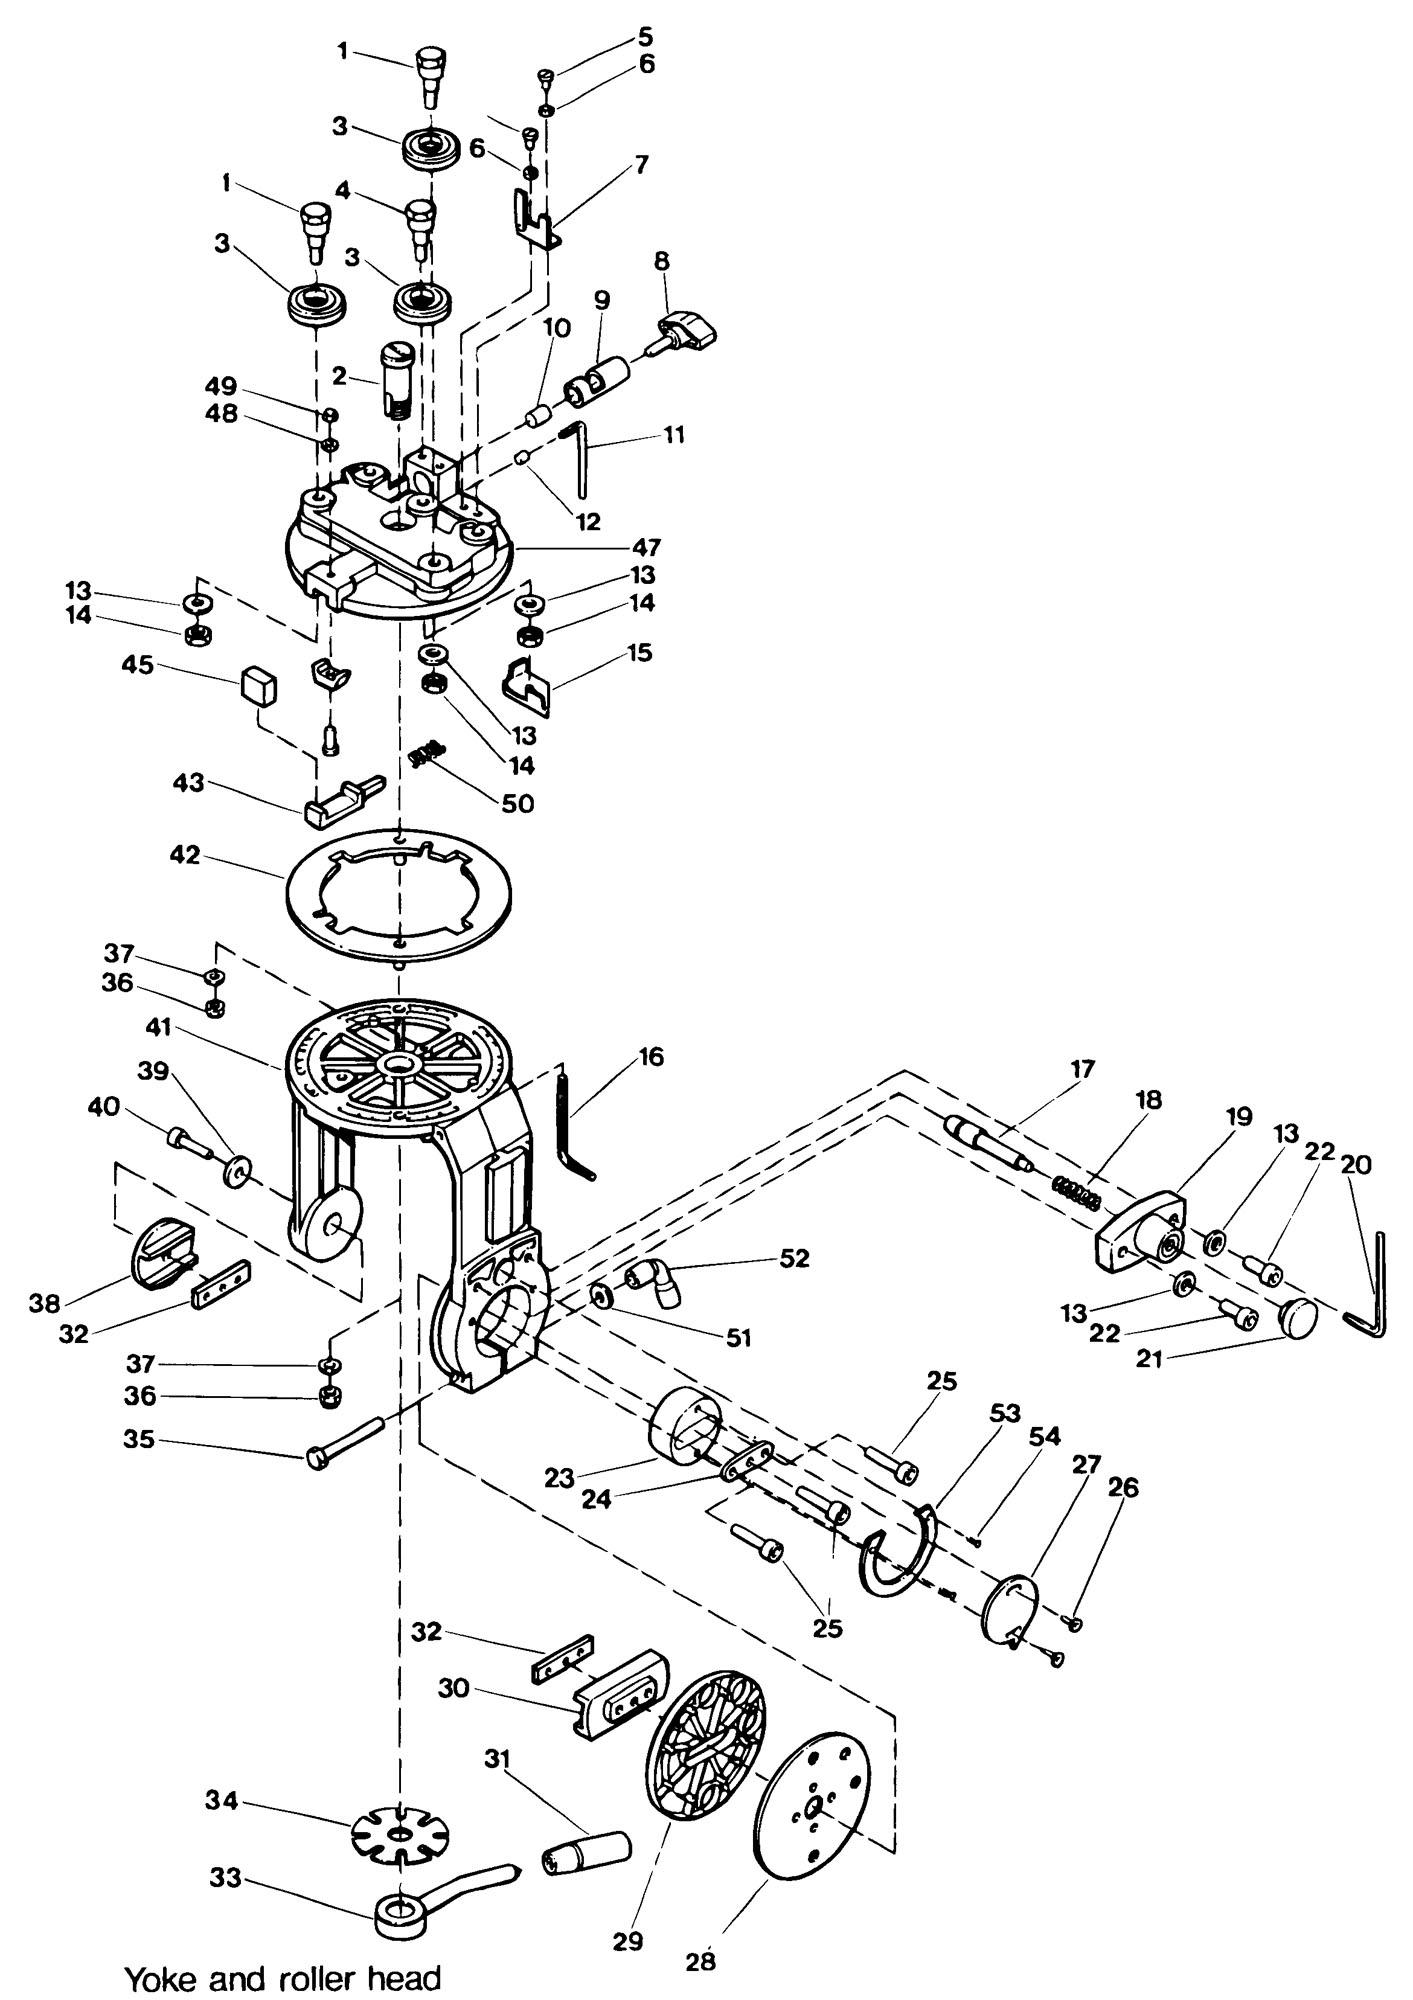 Spares For Dewalt Dw G Radial Arm Saw Type 1